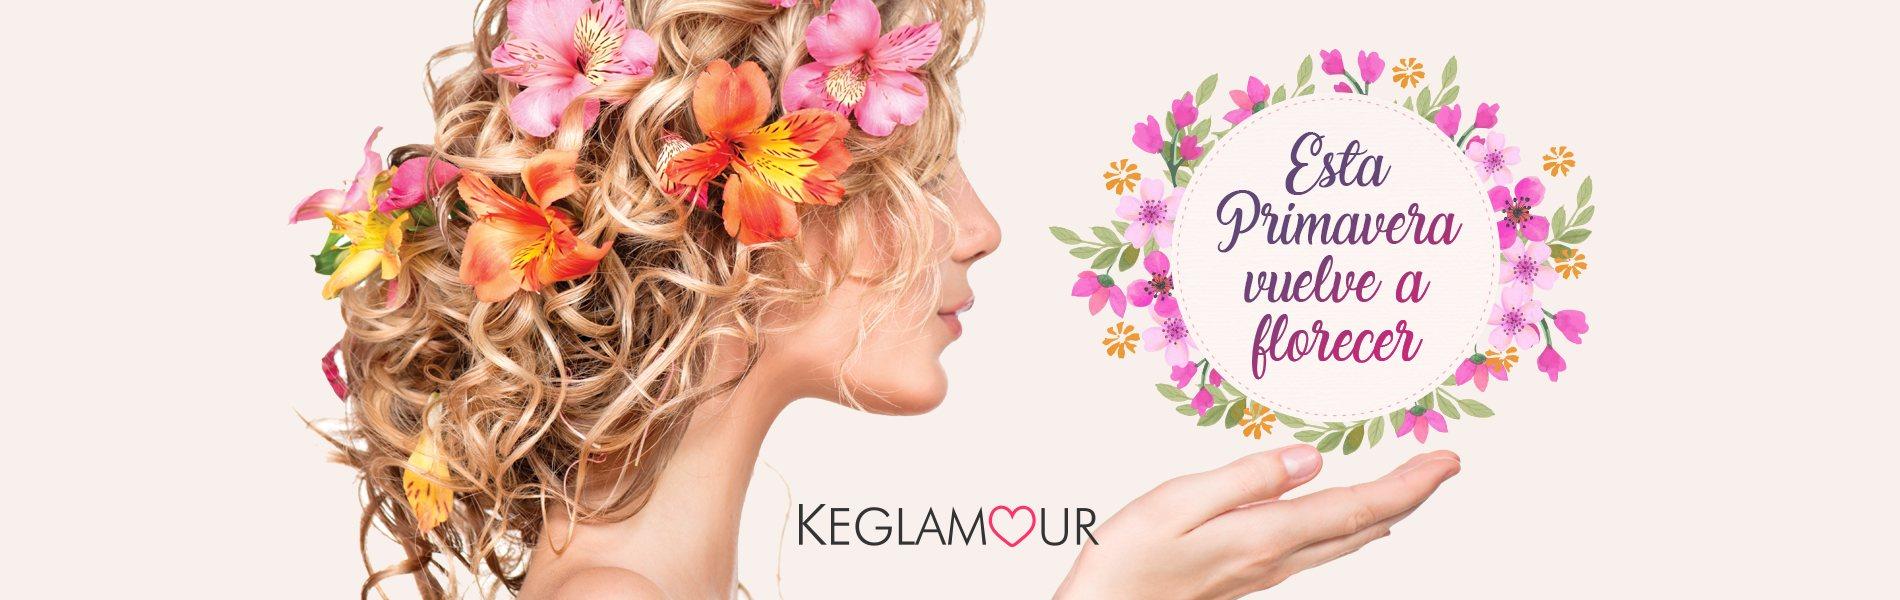 Primavera KeGlamour